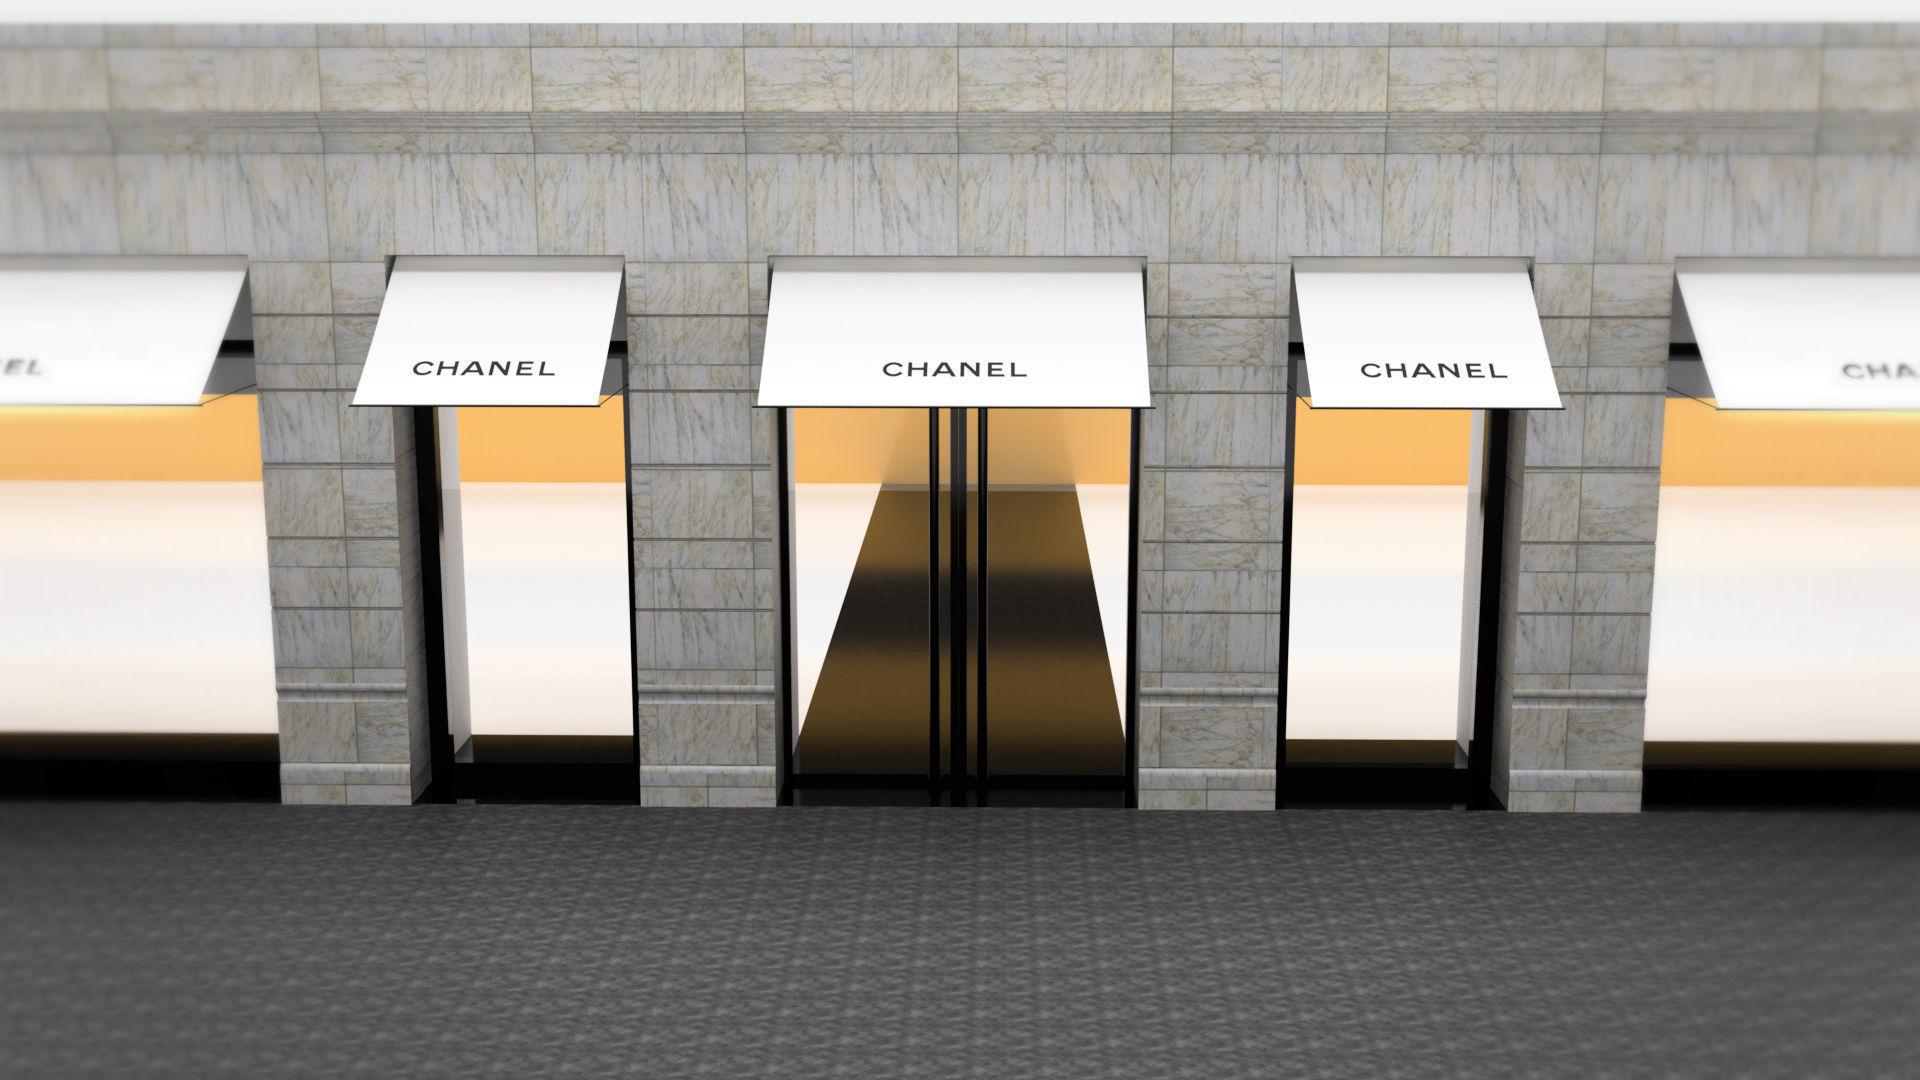 Shop Front - Chanel